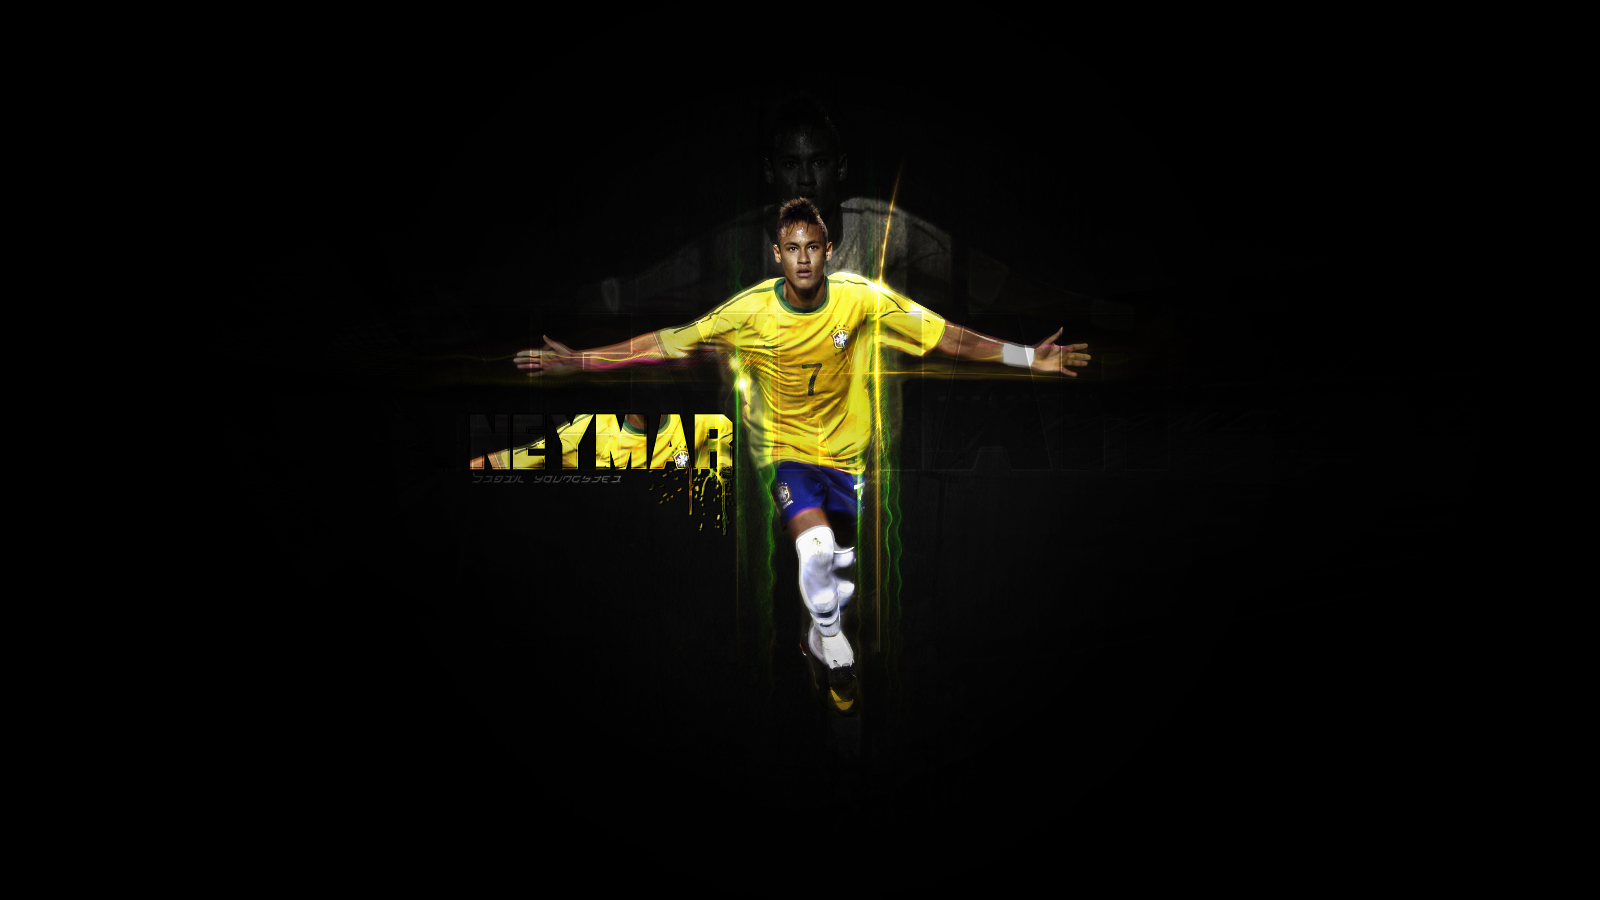 http://1.bp.blogspot.com/-QkuI66rEr4Y/TkK9dcvNtpI/AAAAAAAACug/mRQ6ZDaNkpc/s1600/Neymar-Wallpaper-2011-4.jpg